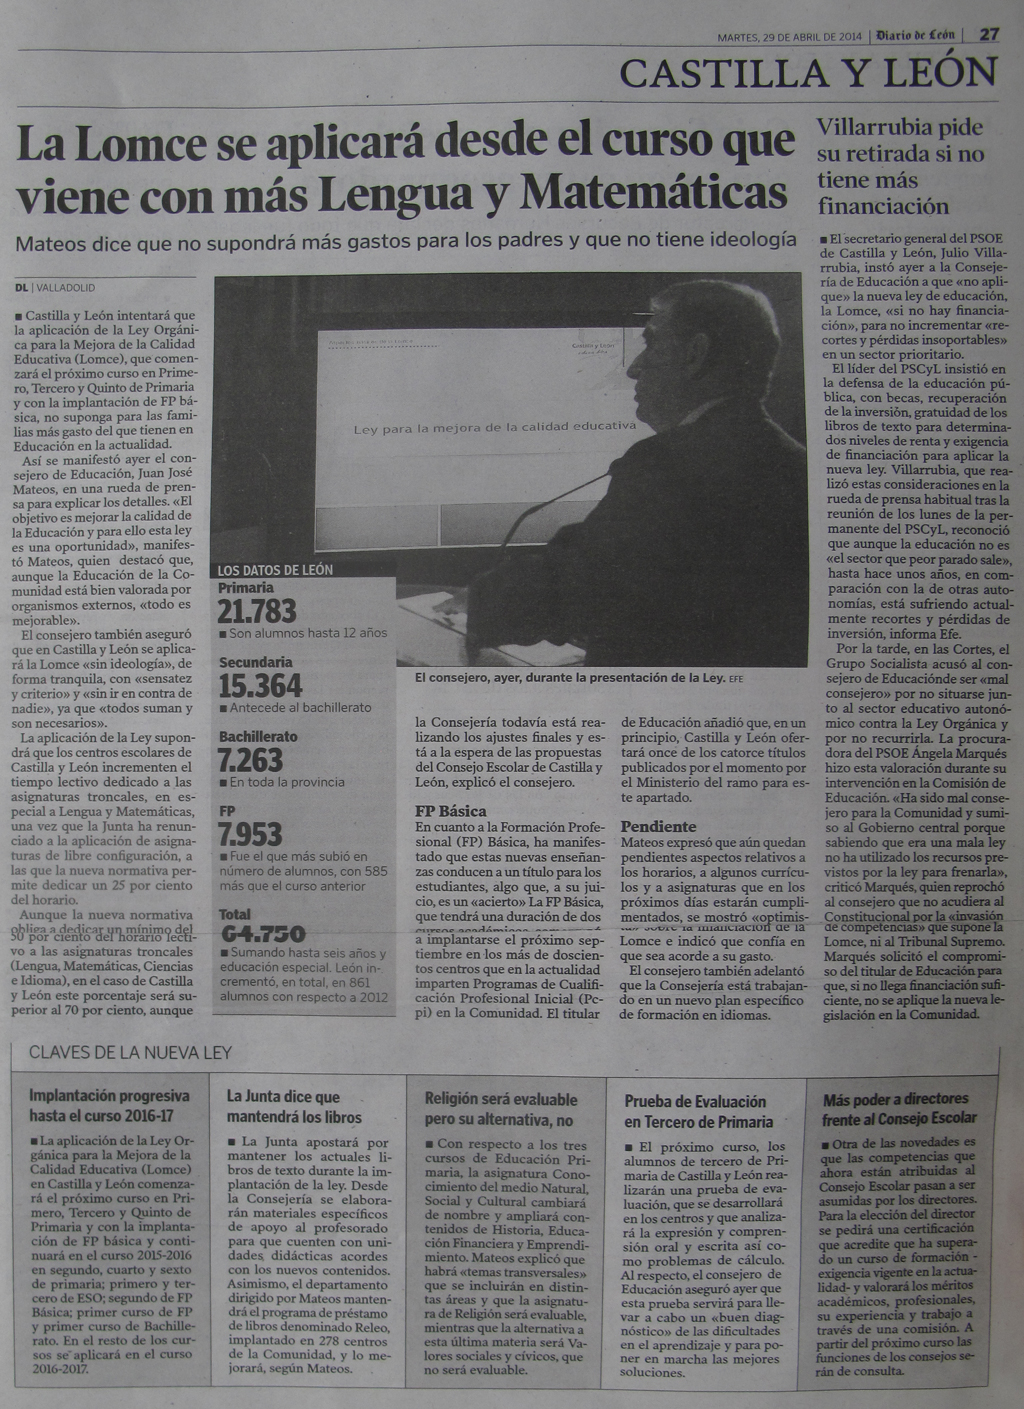 140429_Mateos_en_la_prensa_DL